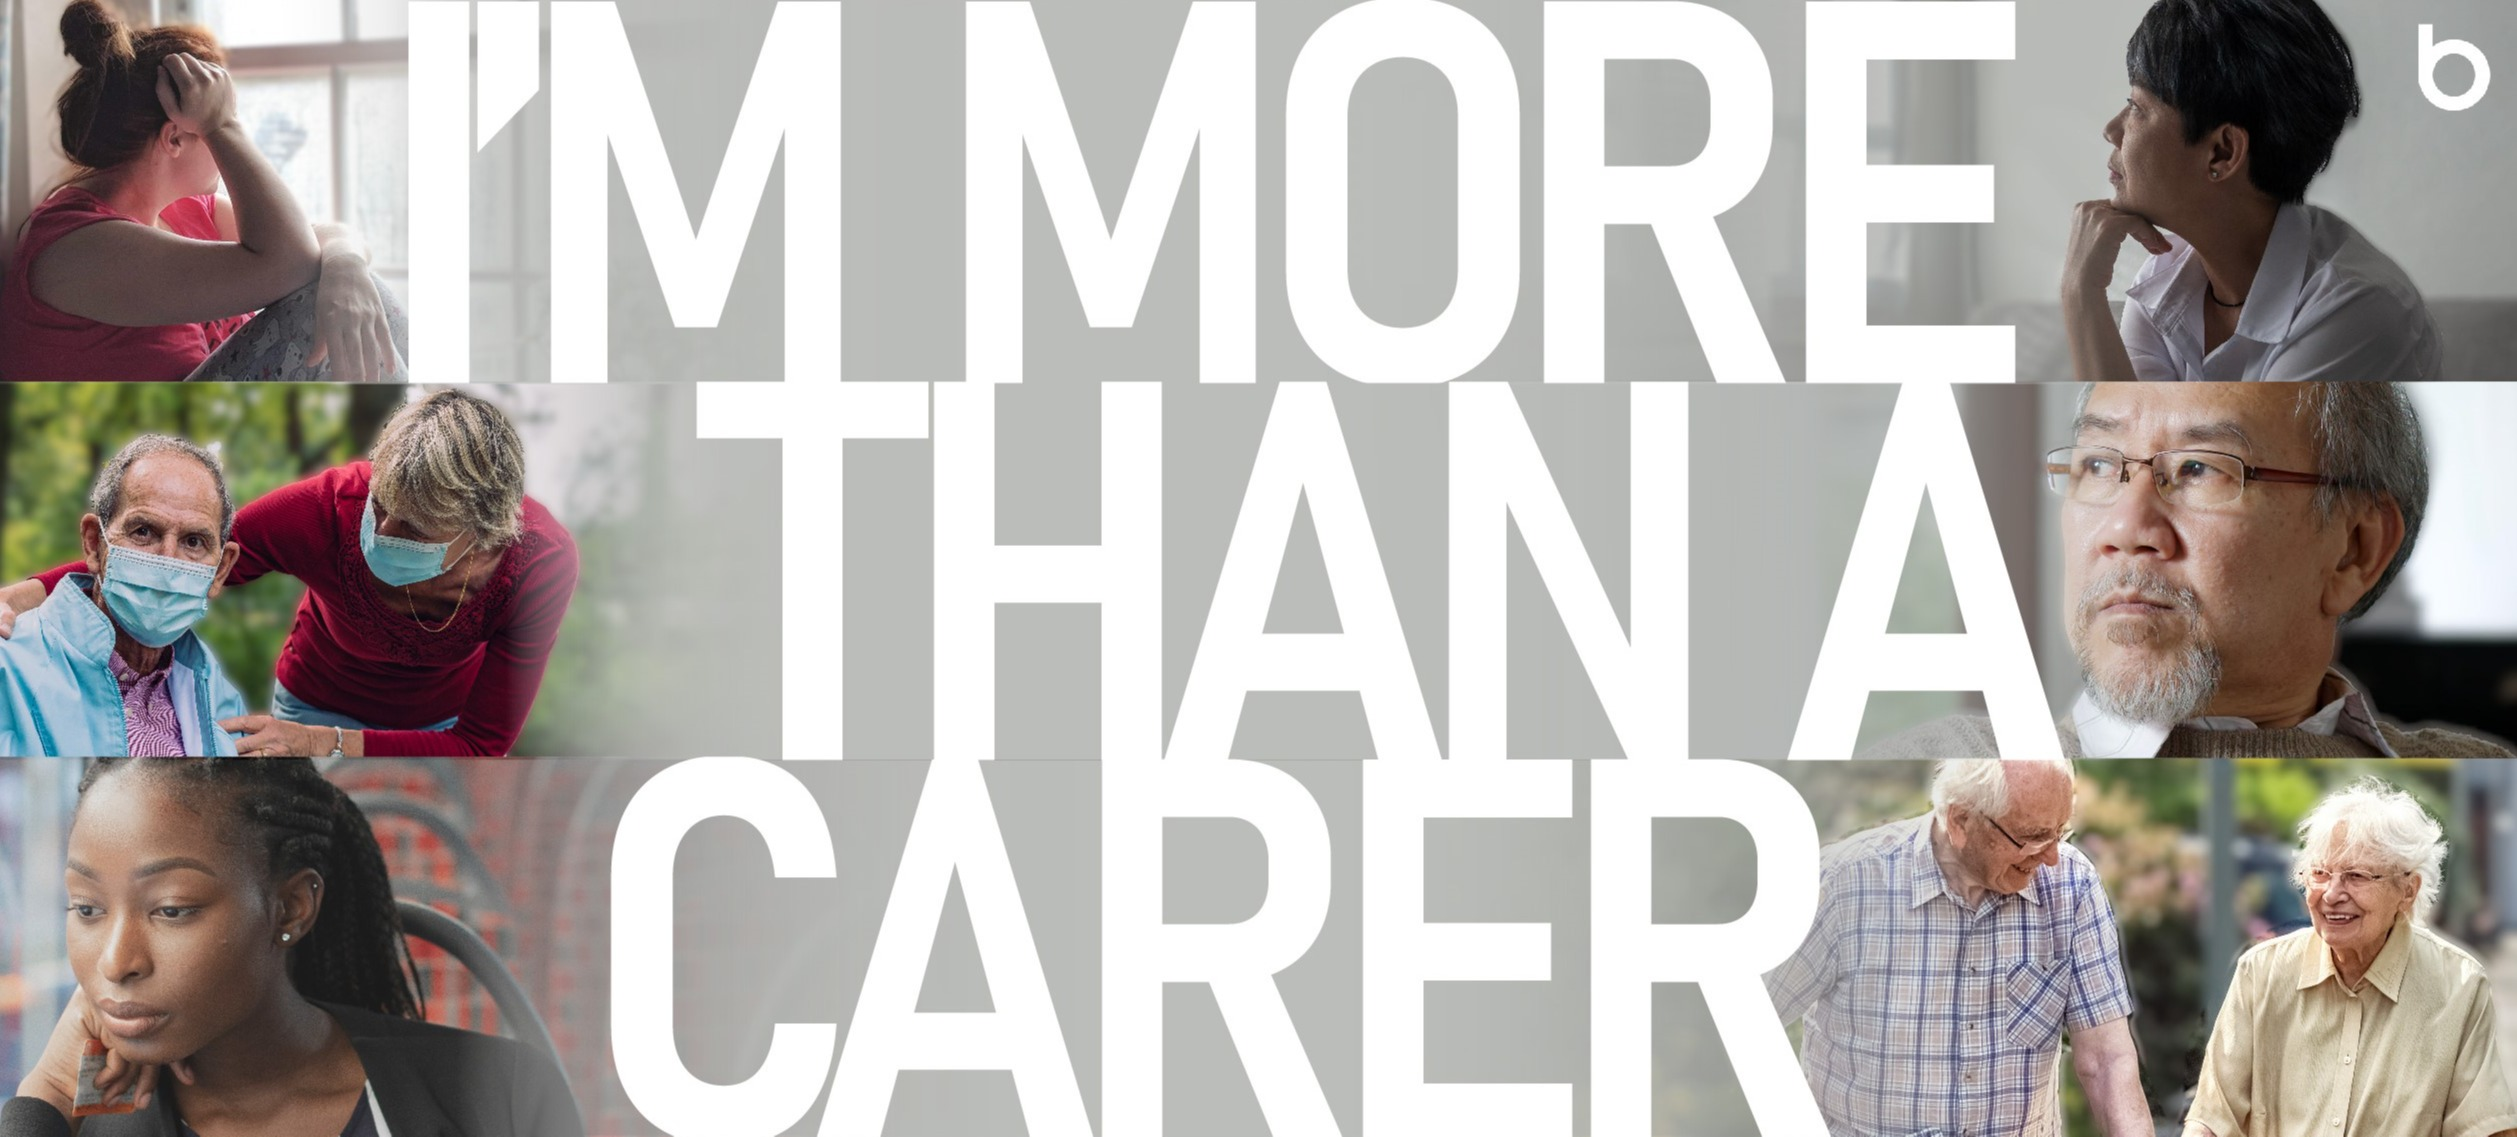 I'm more than a carer banner